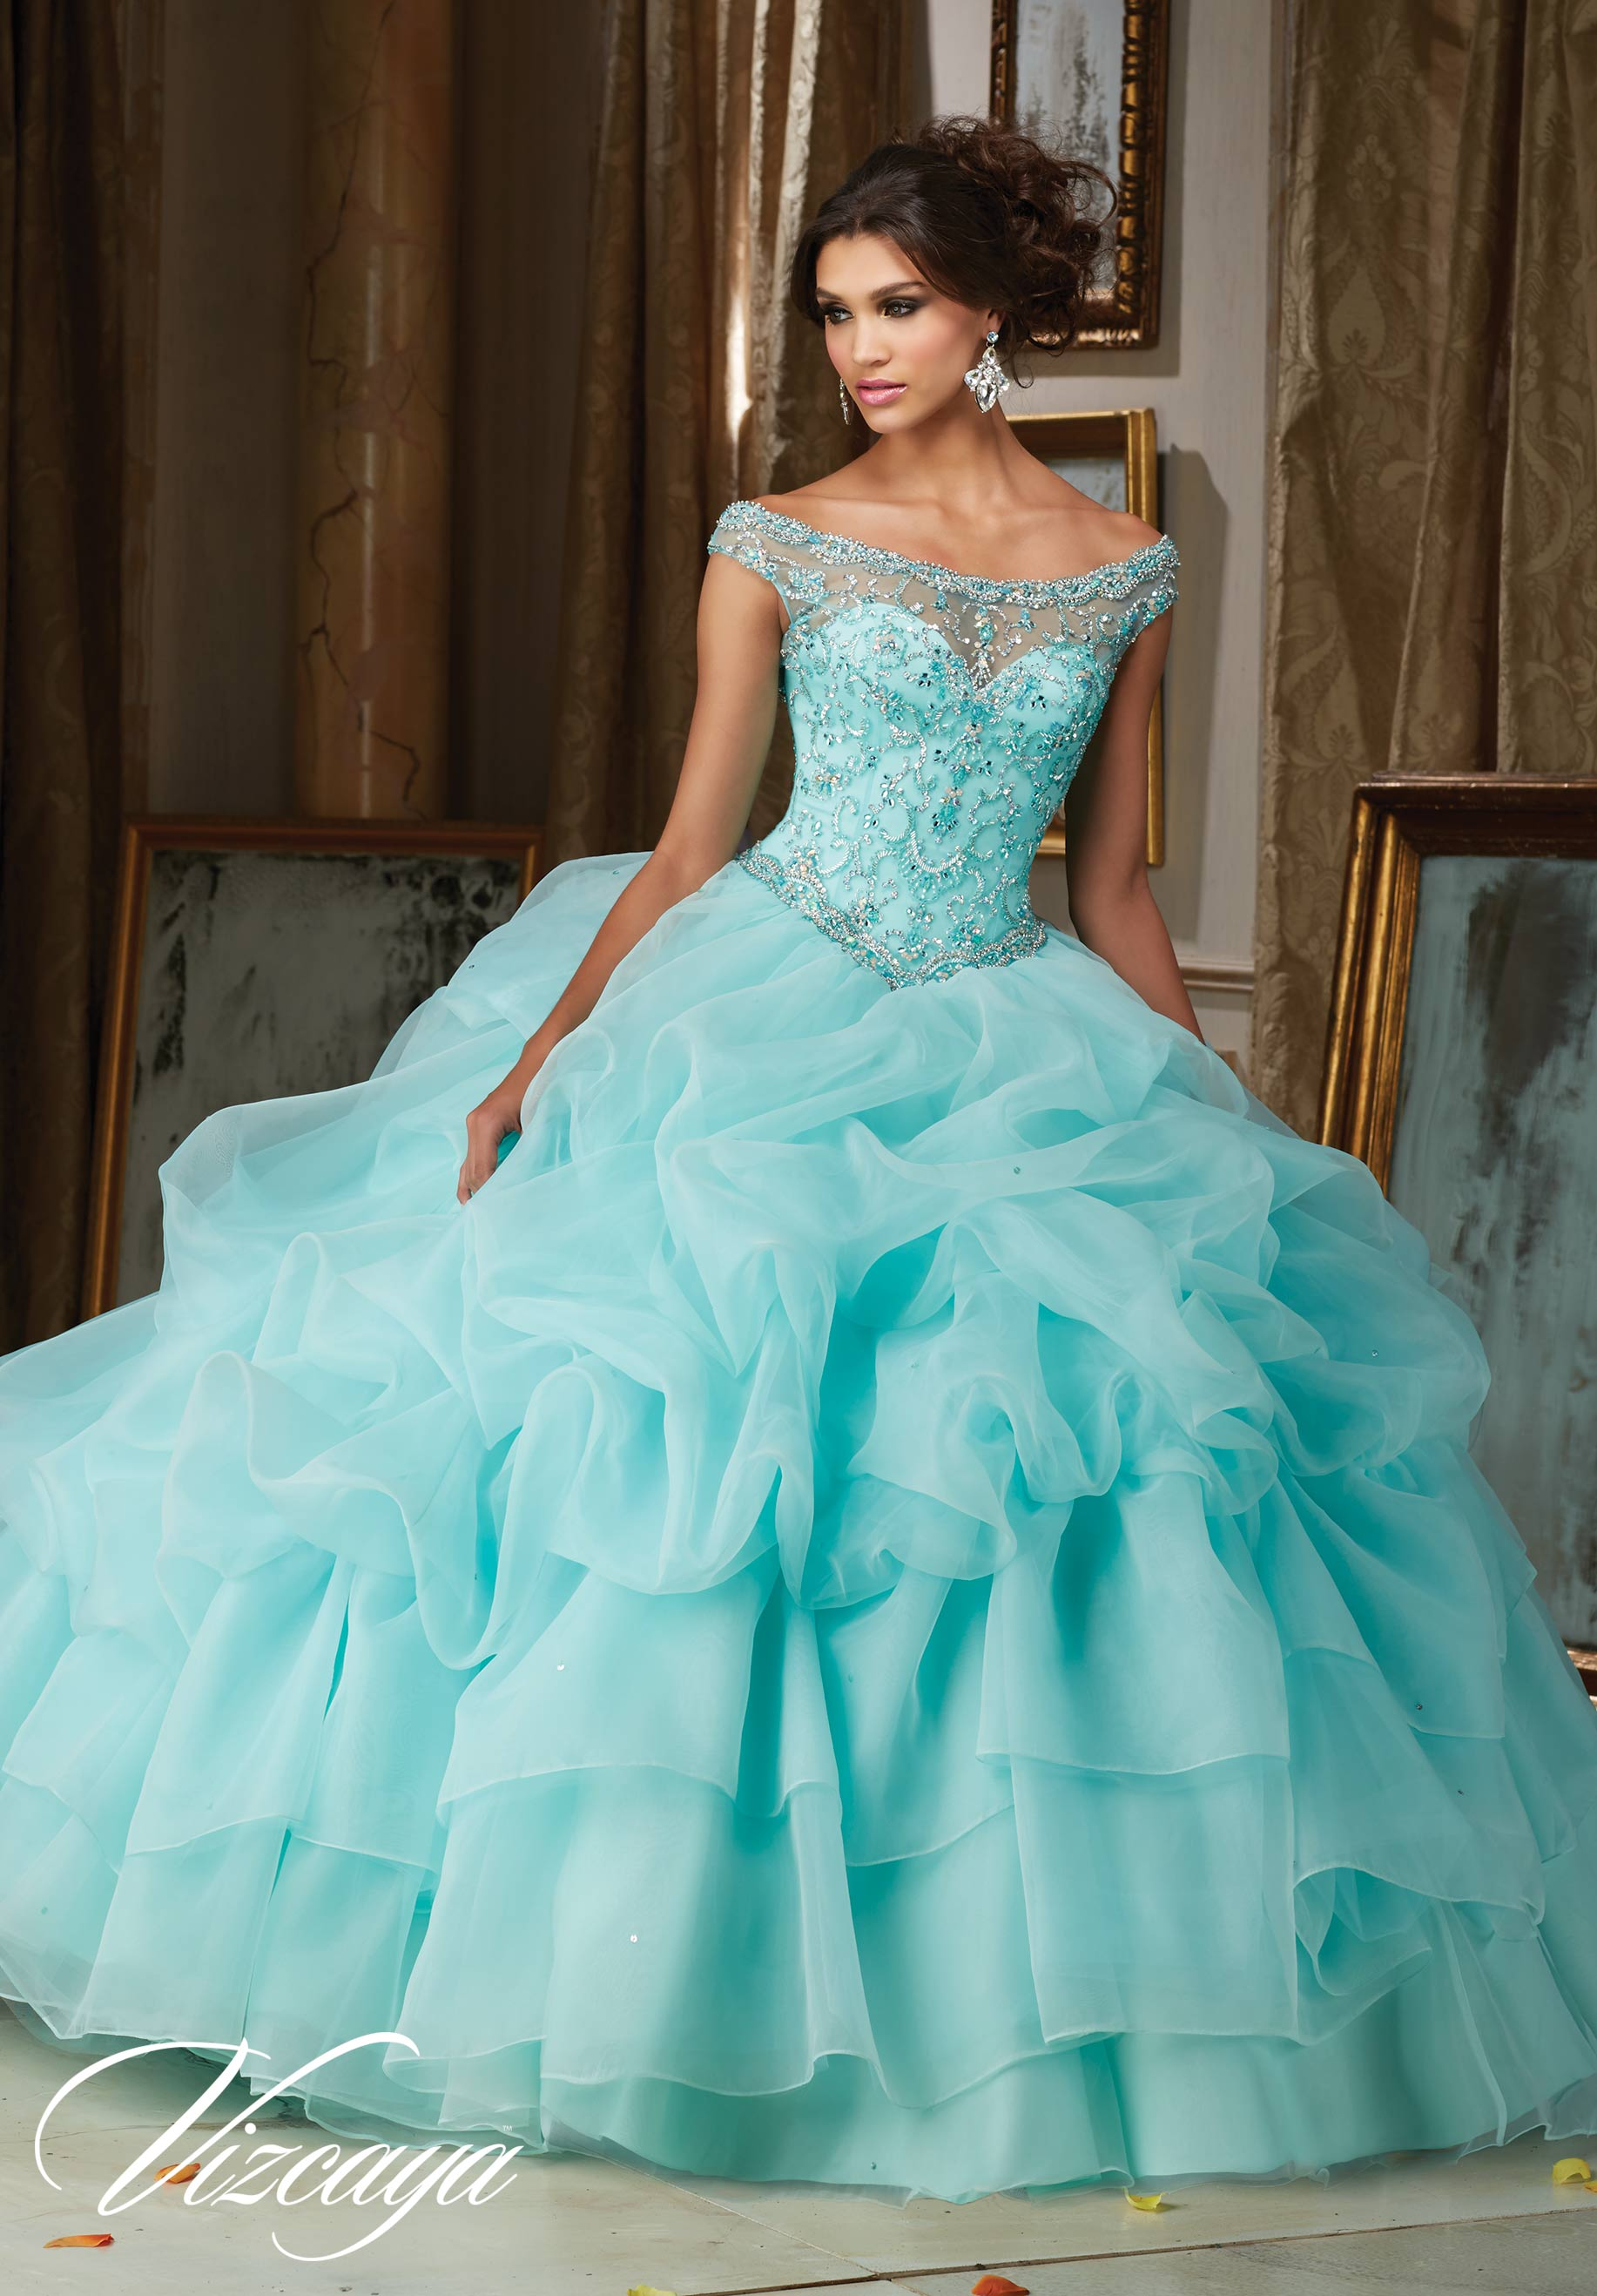 Elegancia Bridal Austin | Quinceanera Dresses, Prom Dresses ...